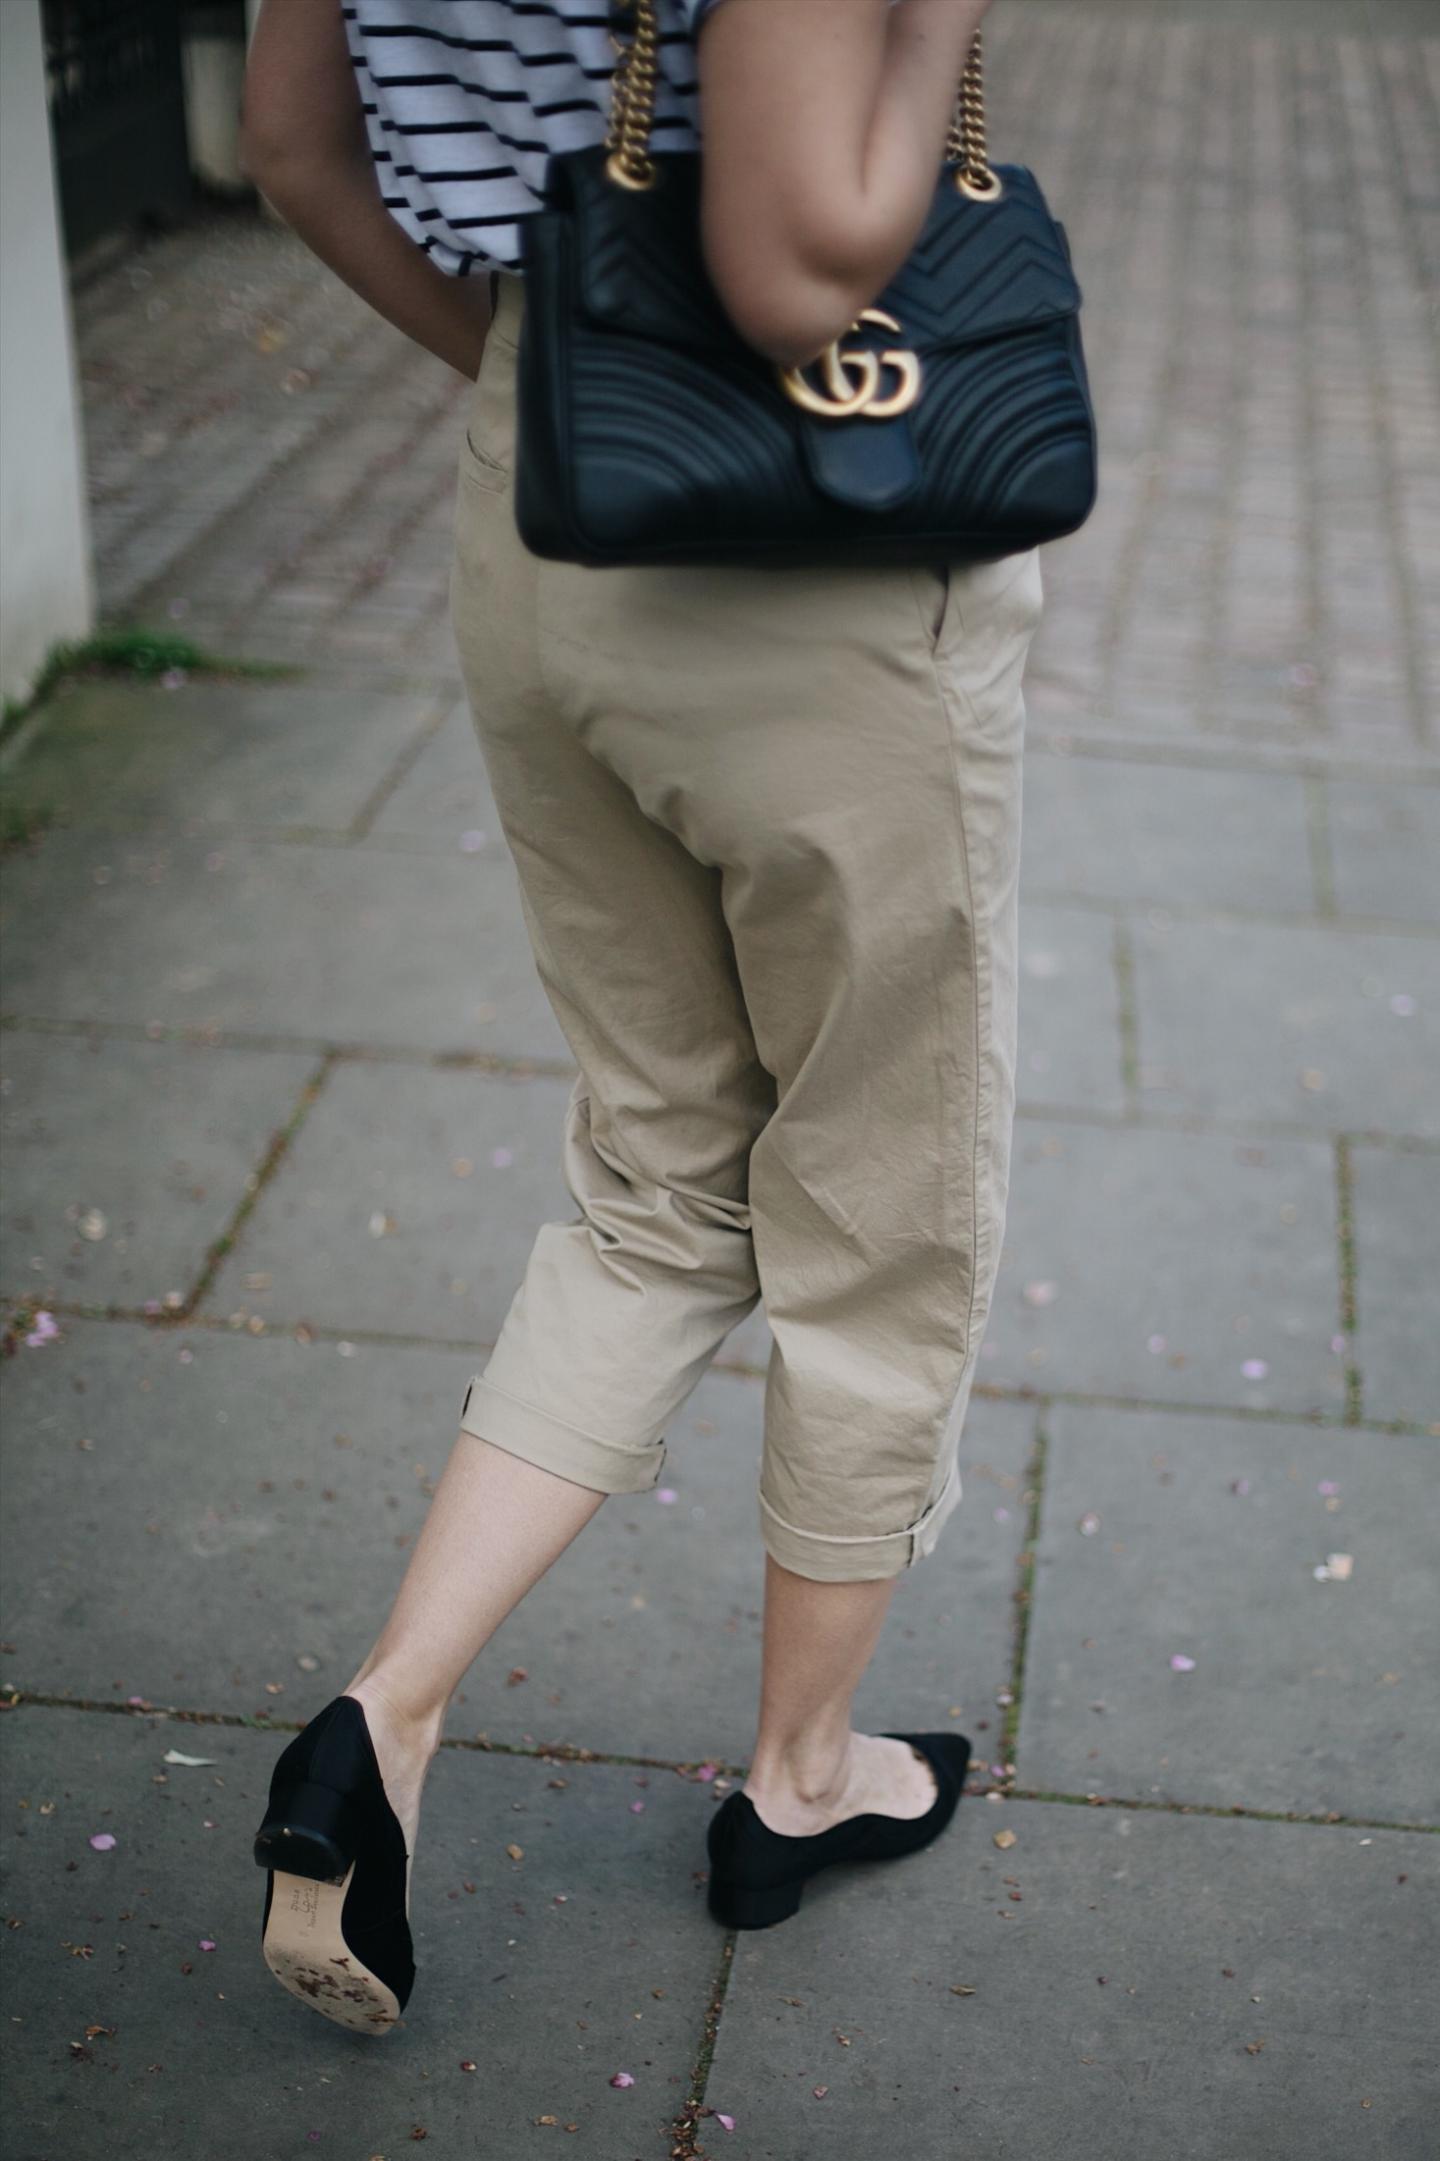 Emma Hill wears Dune x Rupert Sanderson 'Grace Hi' black satin low heels, beige high waisted chino trousers, stripe t-shirt, Gucci Marmont bag